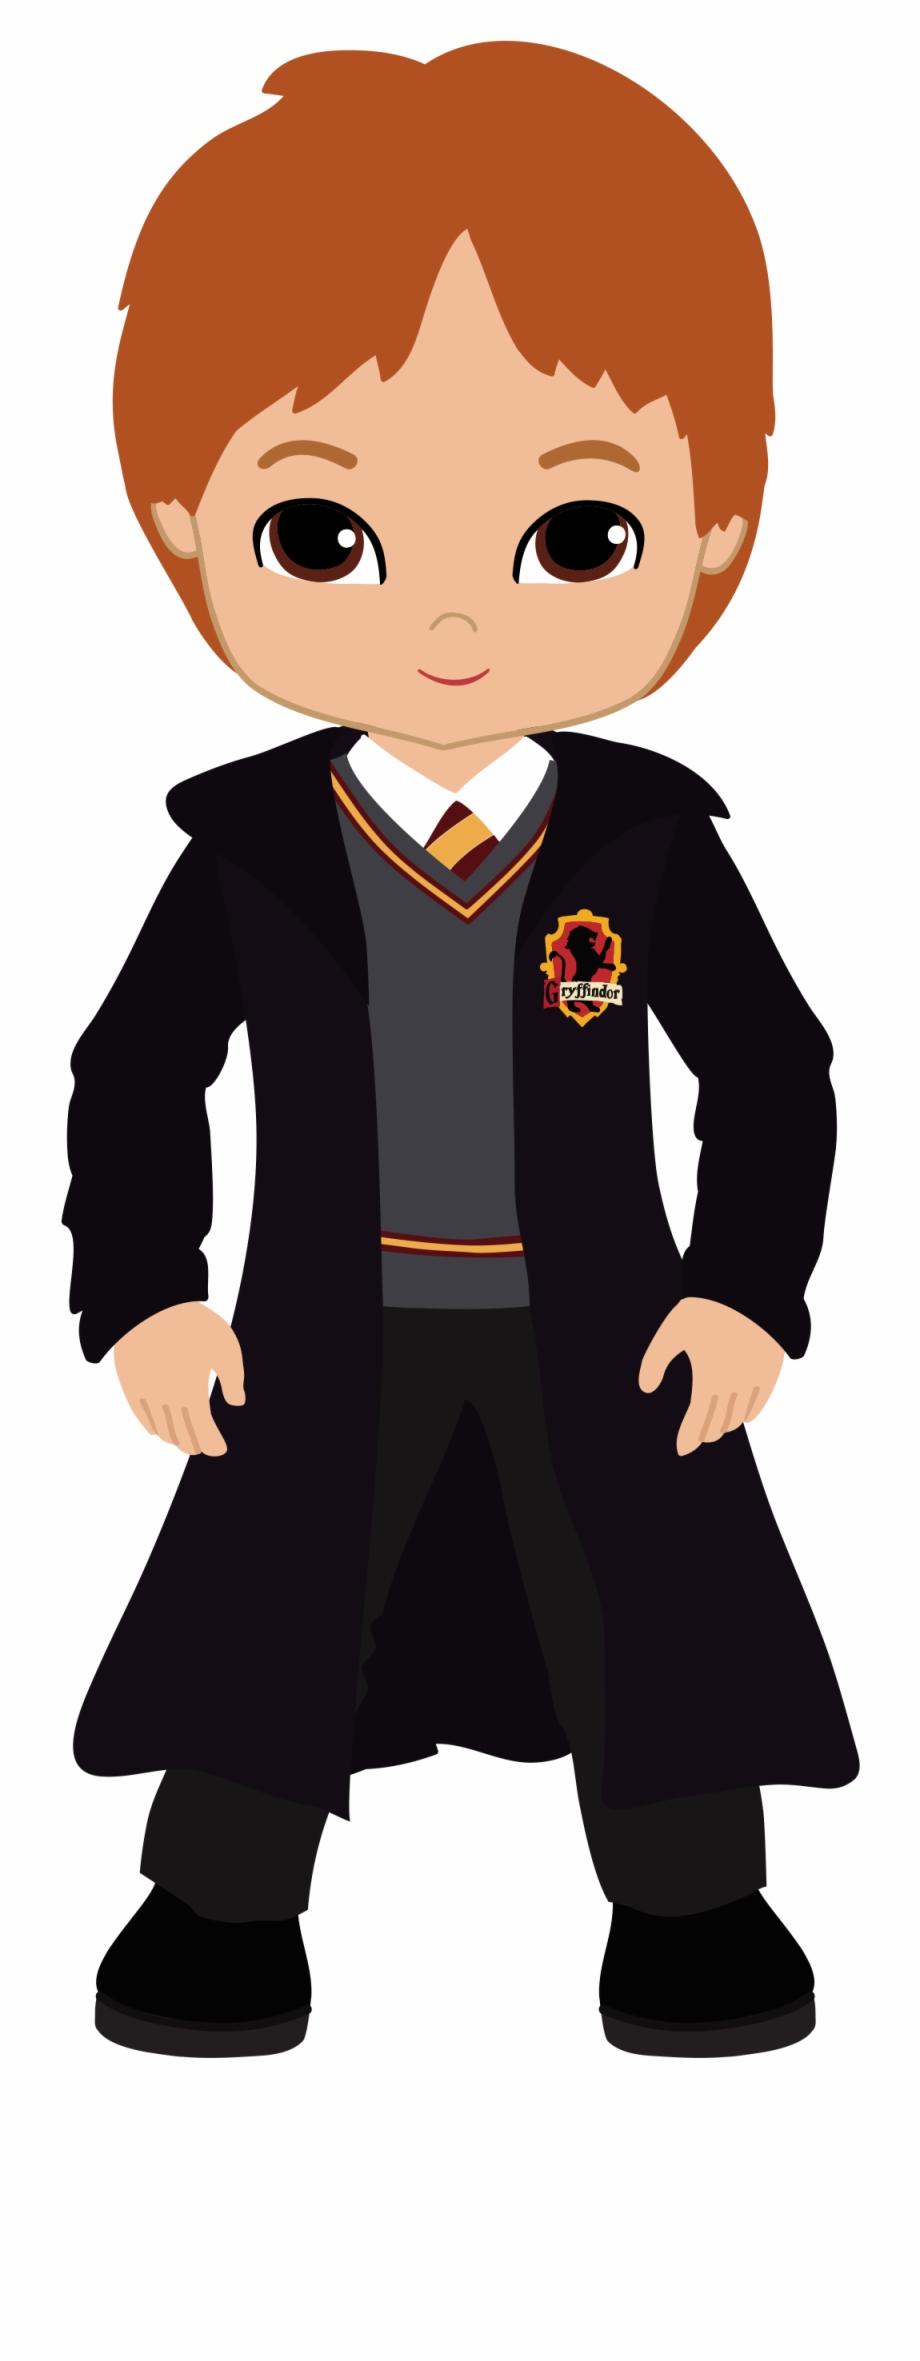 Harry Potter Cartoon Drawing Harry Potter Cartoon Character.